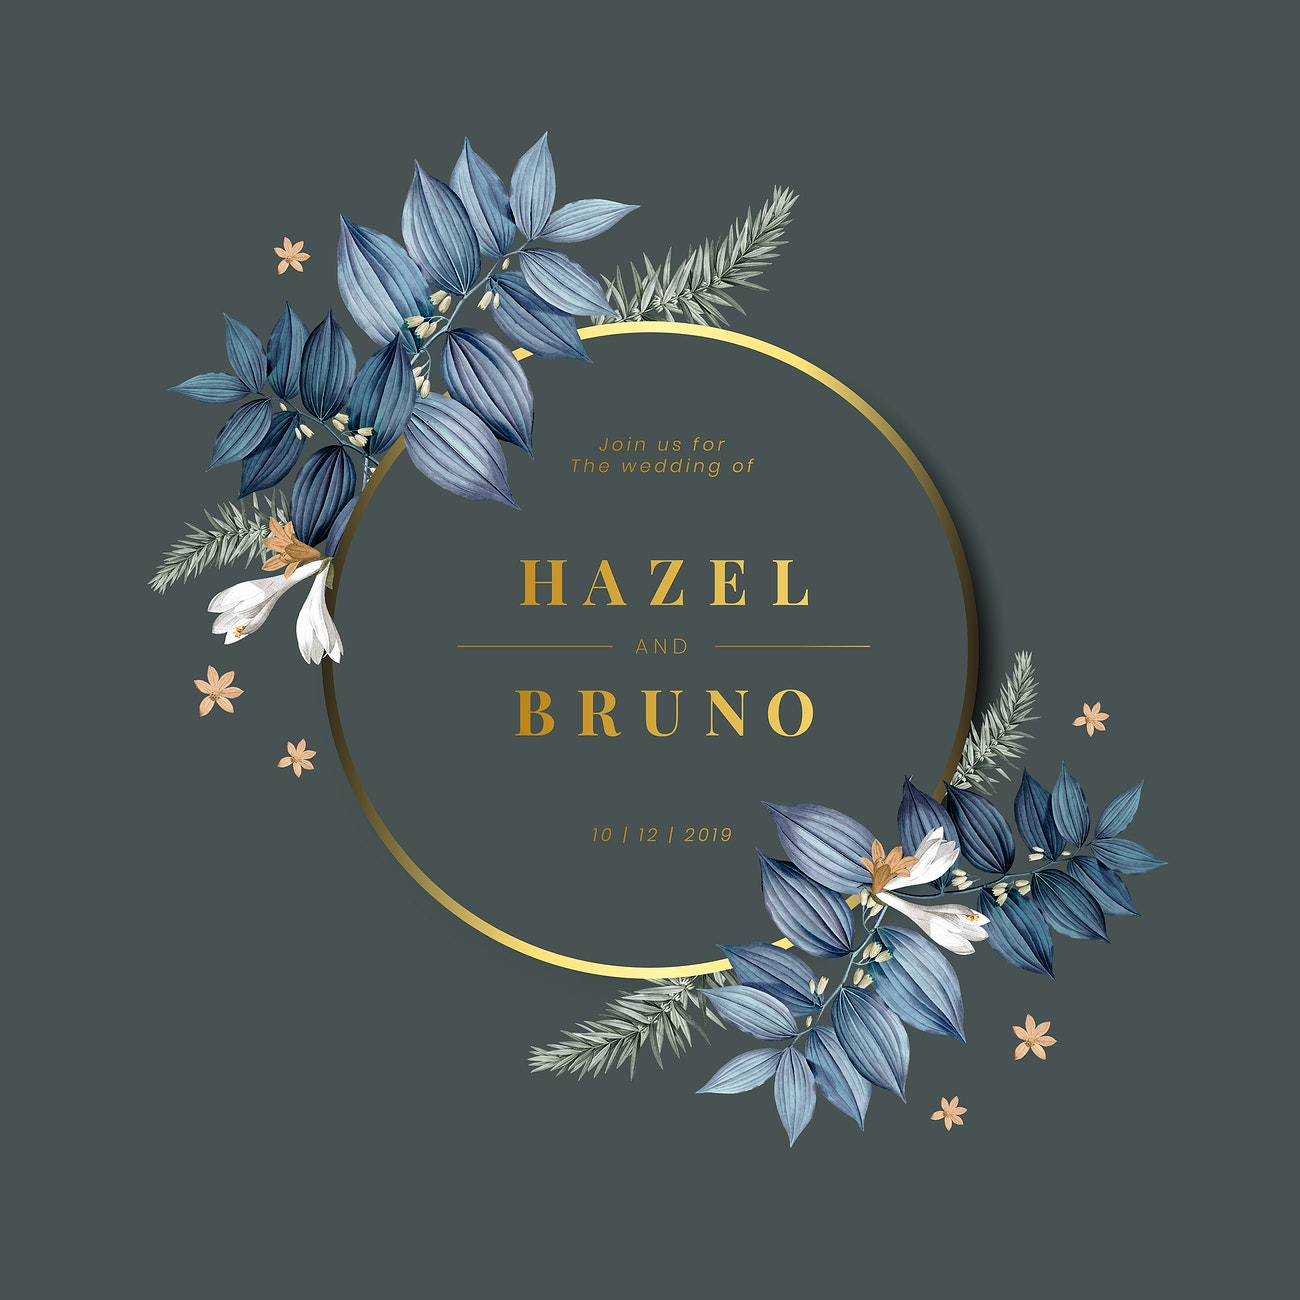 Floral wedding invitation card design vector | Royalty free vector - 520482